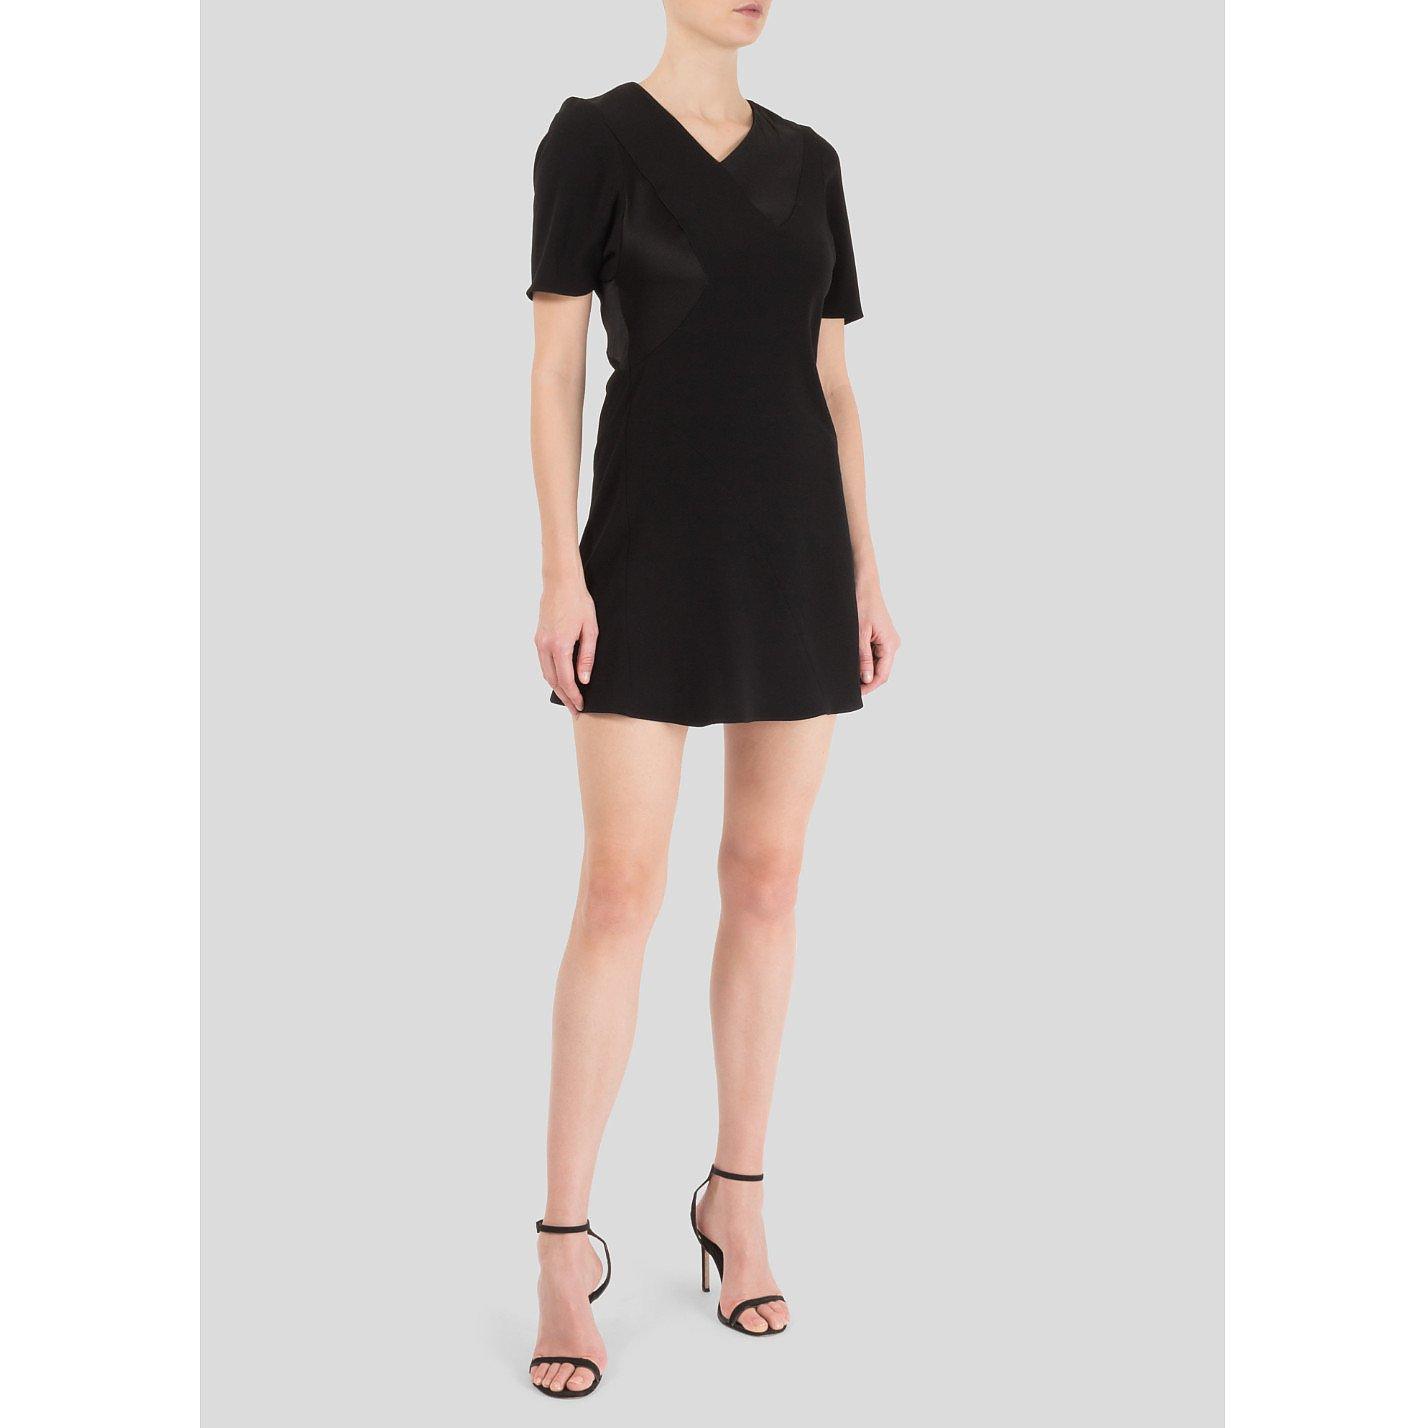 Balenciaga Mini Dress With Satin Panels